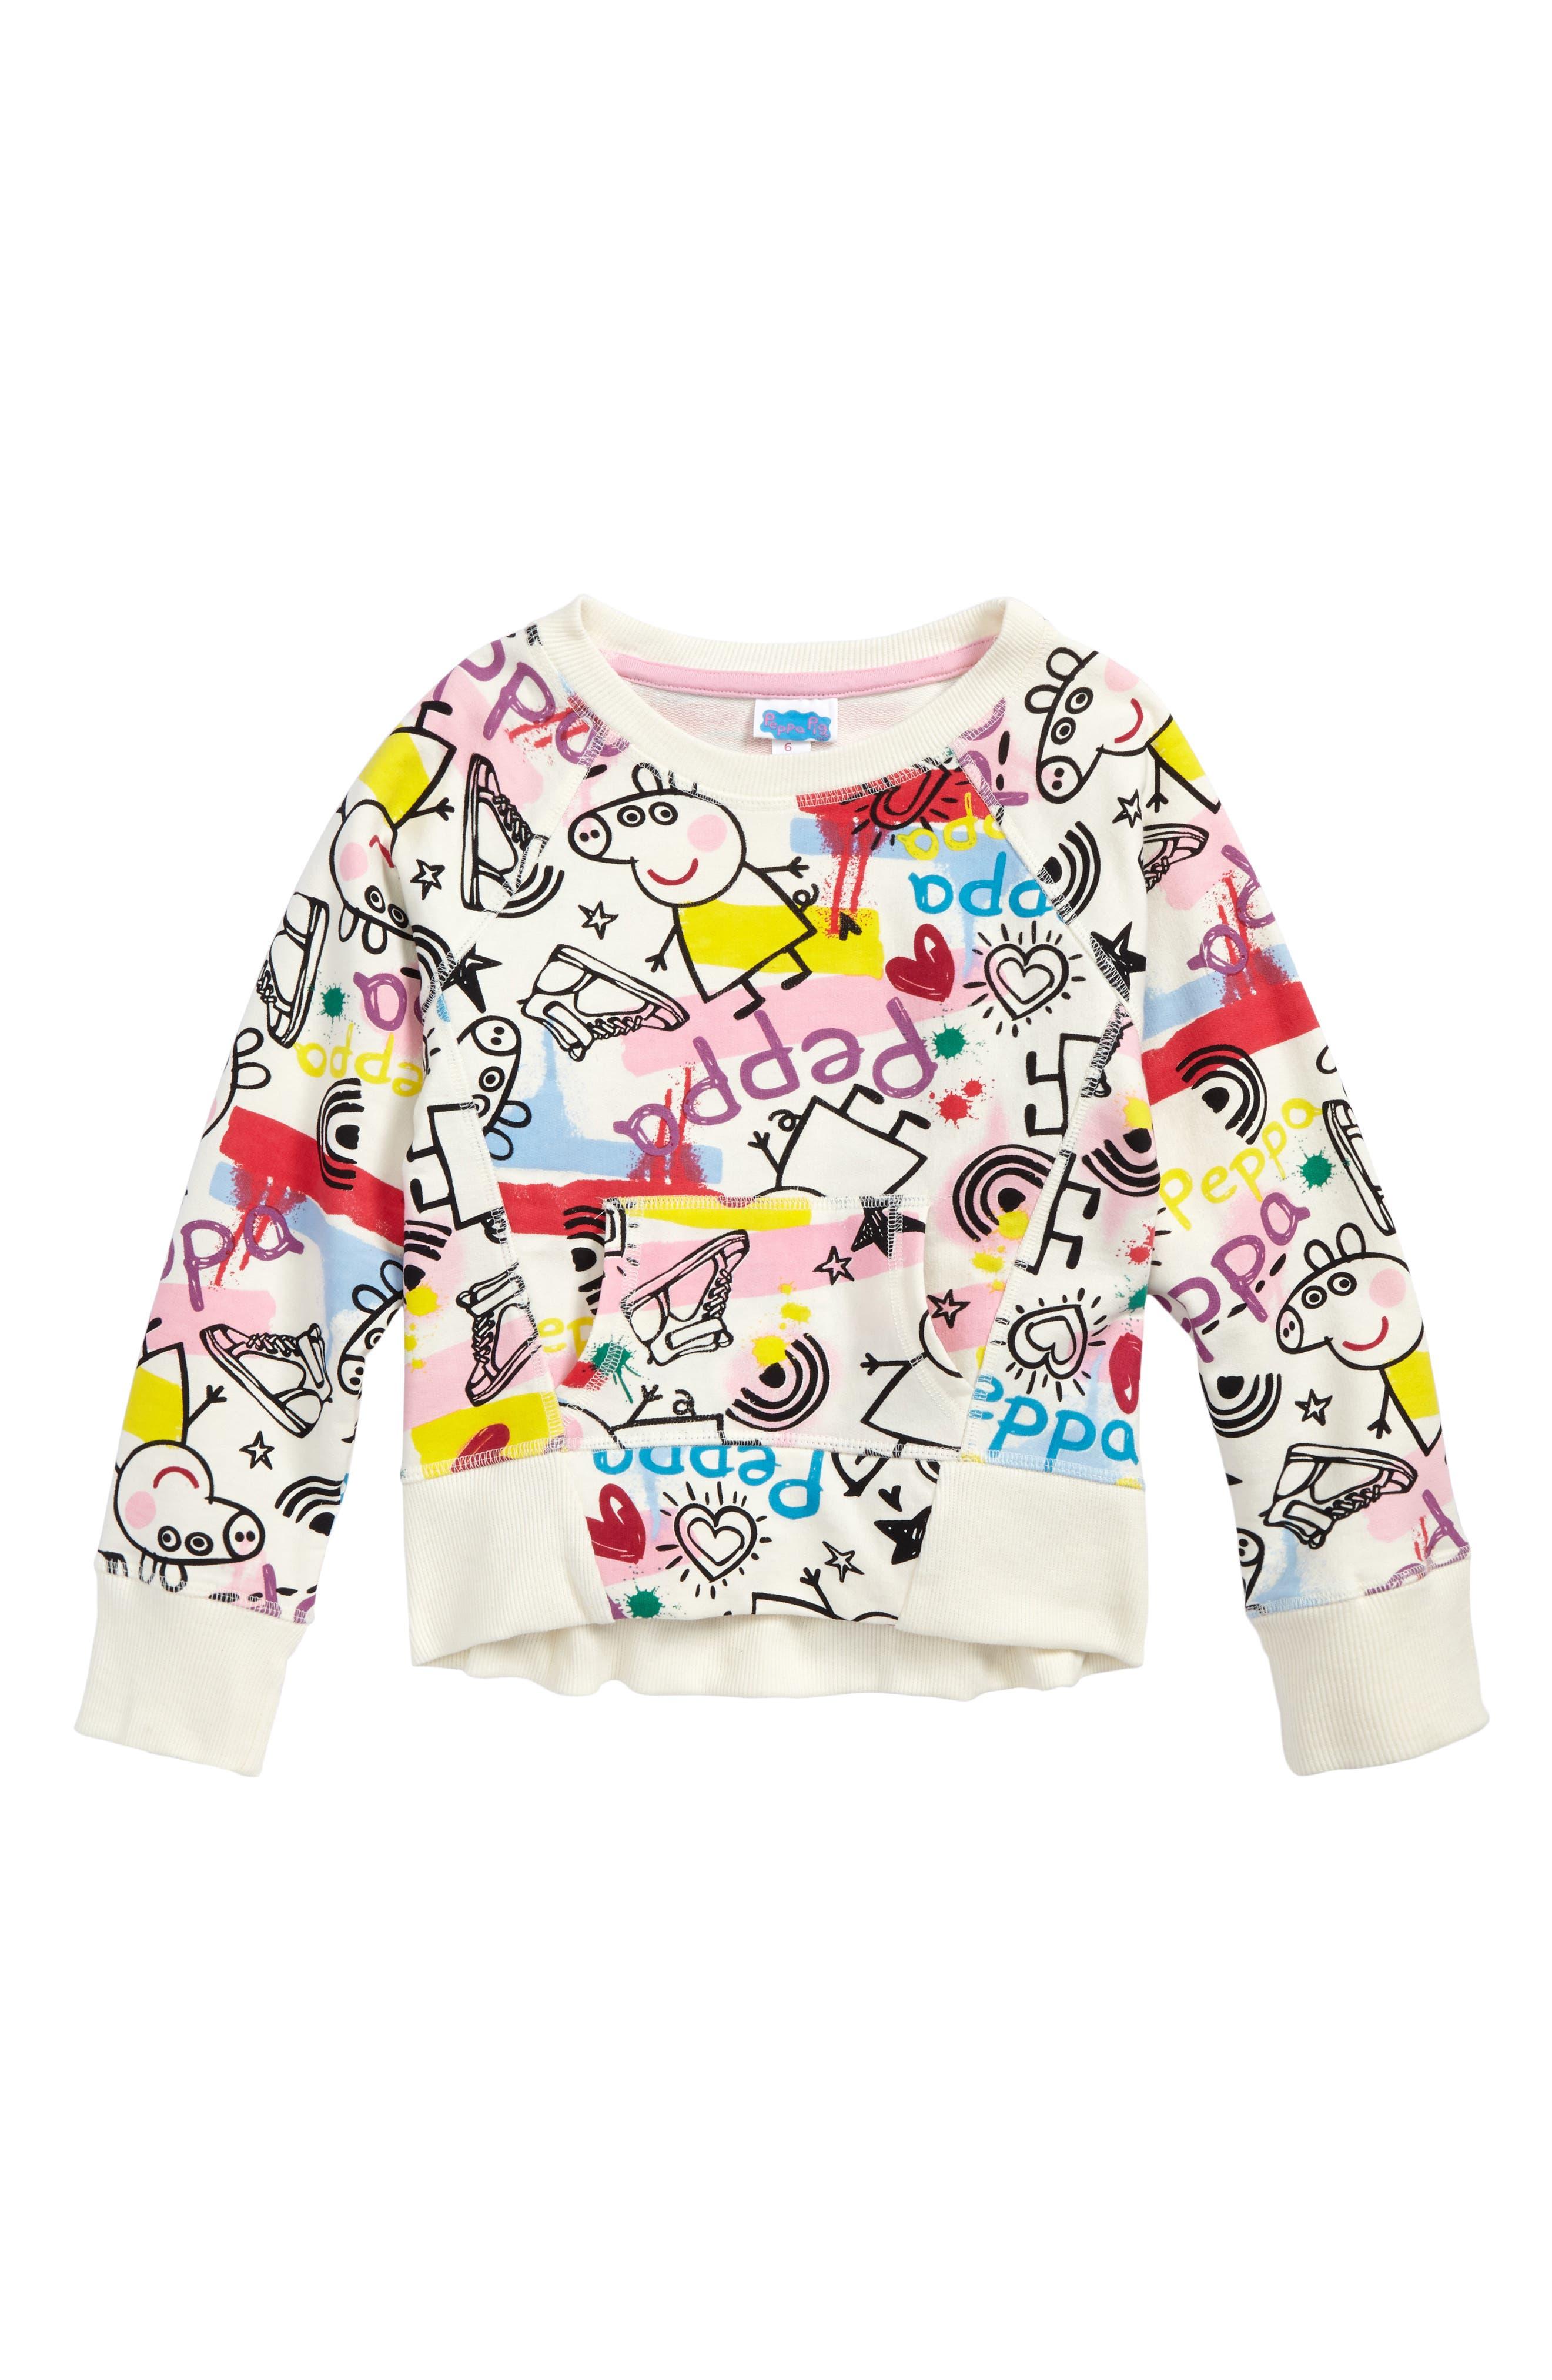 Peppa Pig Graphic Sweatshirt,                             Main thumbnail 1, color,                             901